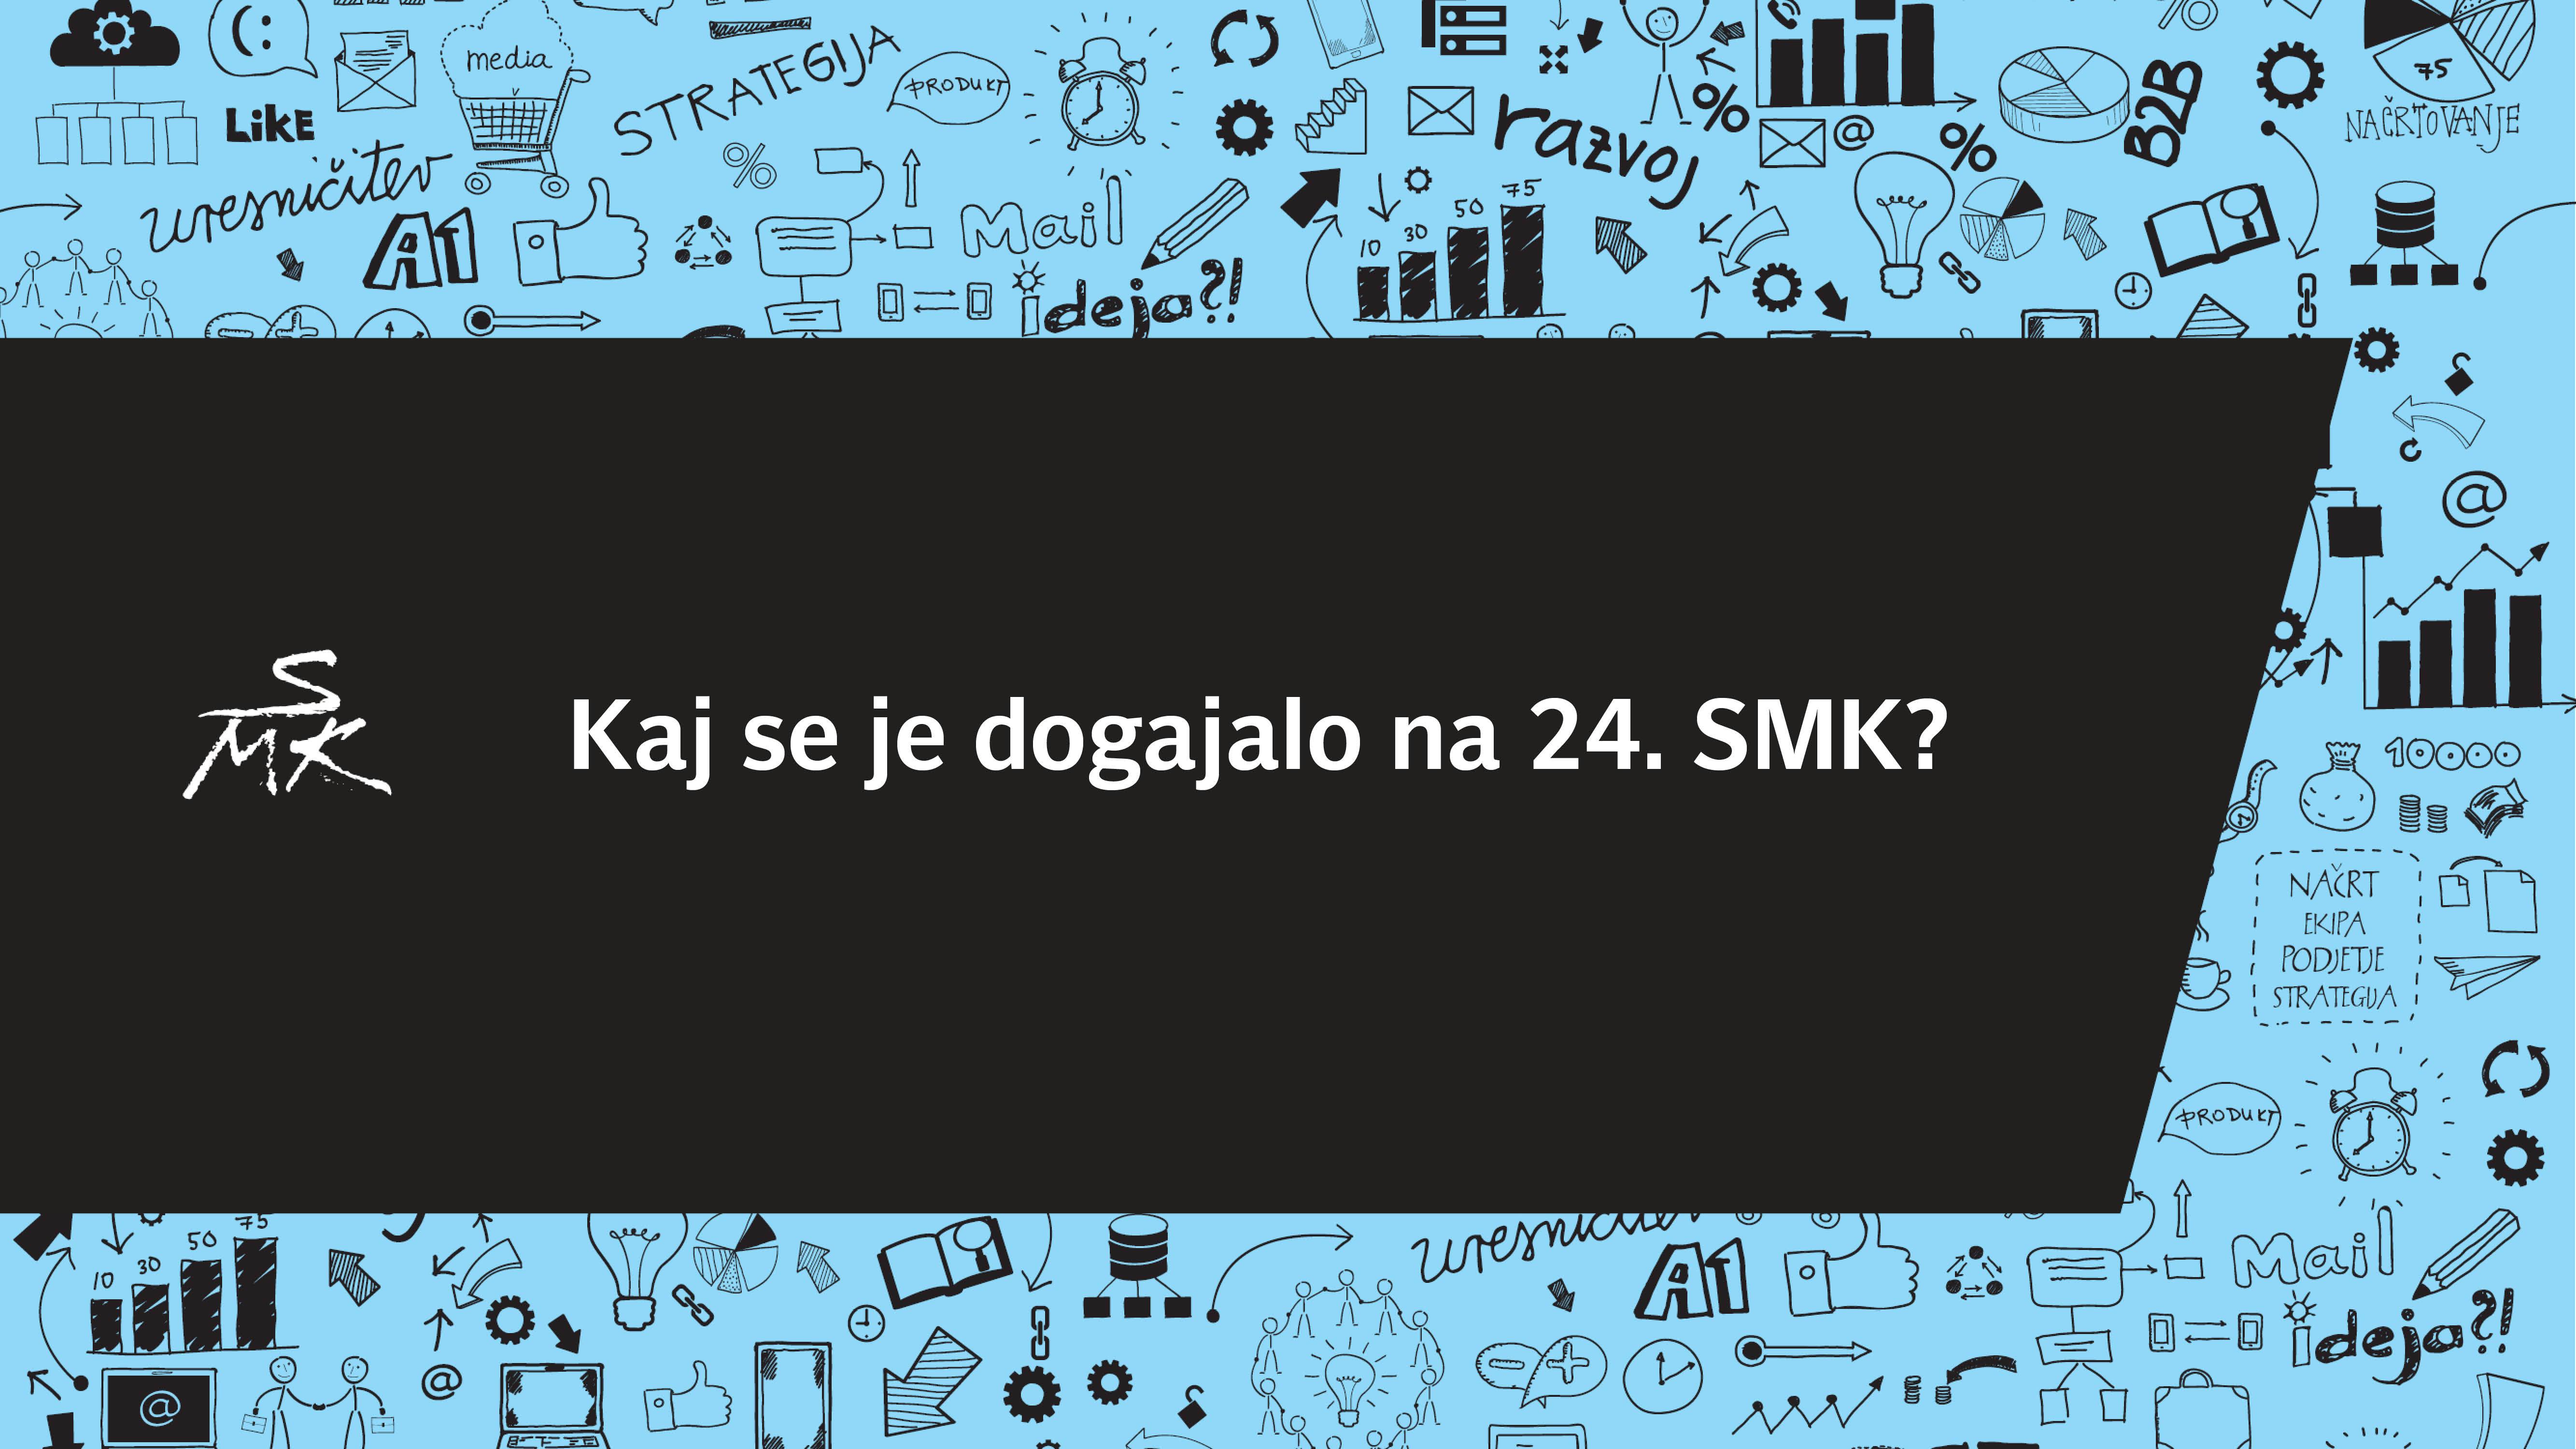 (video) Kako smo se imeli na 24.Slovenski marketinški konferenci?